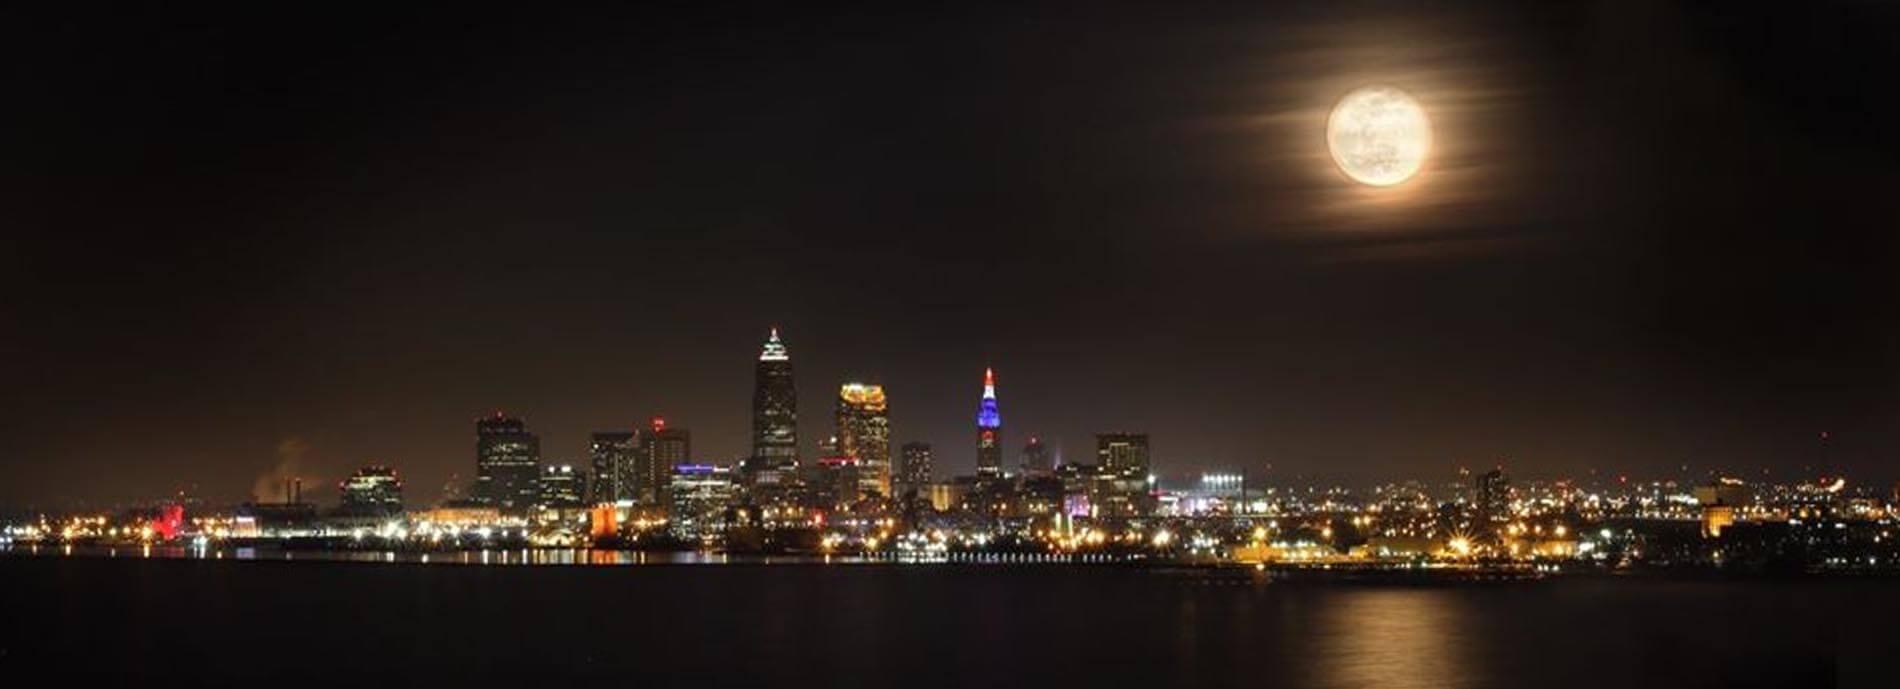 Dan Morgan photo Cleveland skyline night